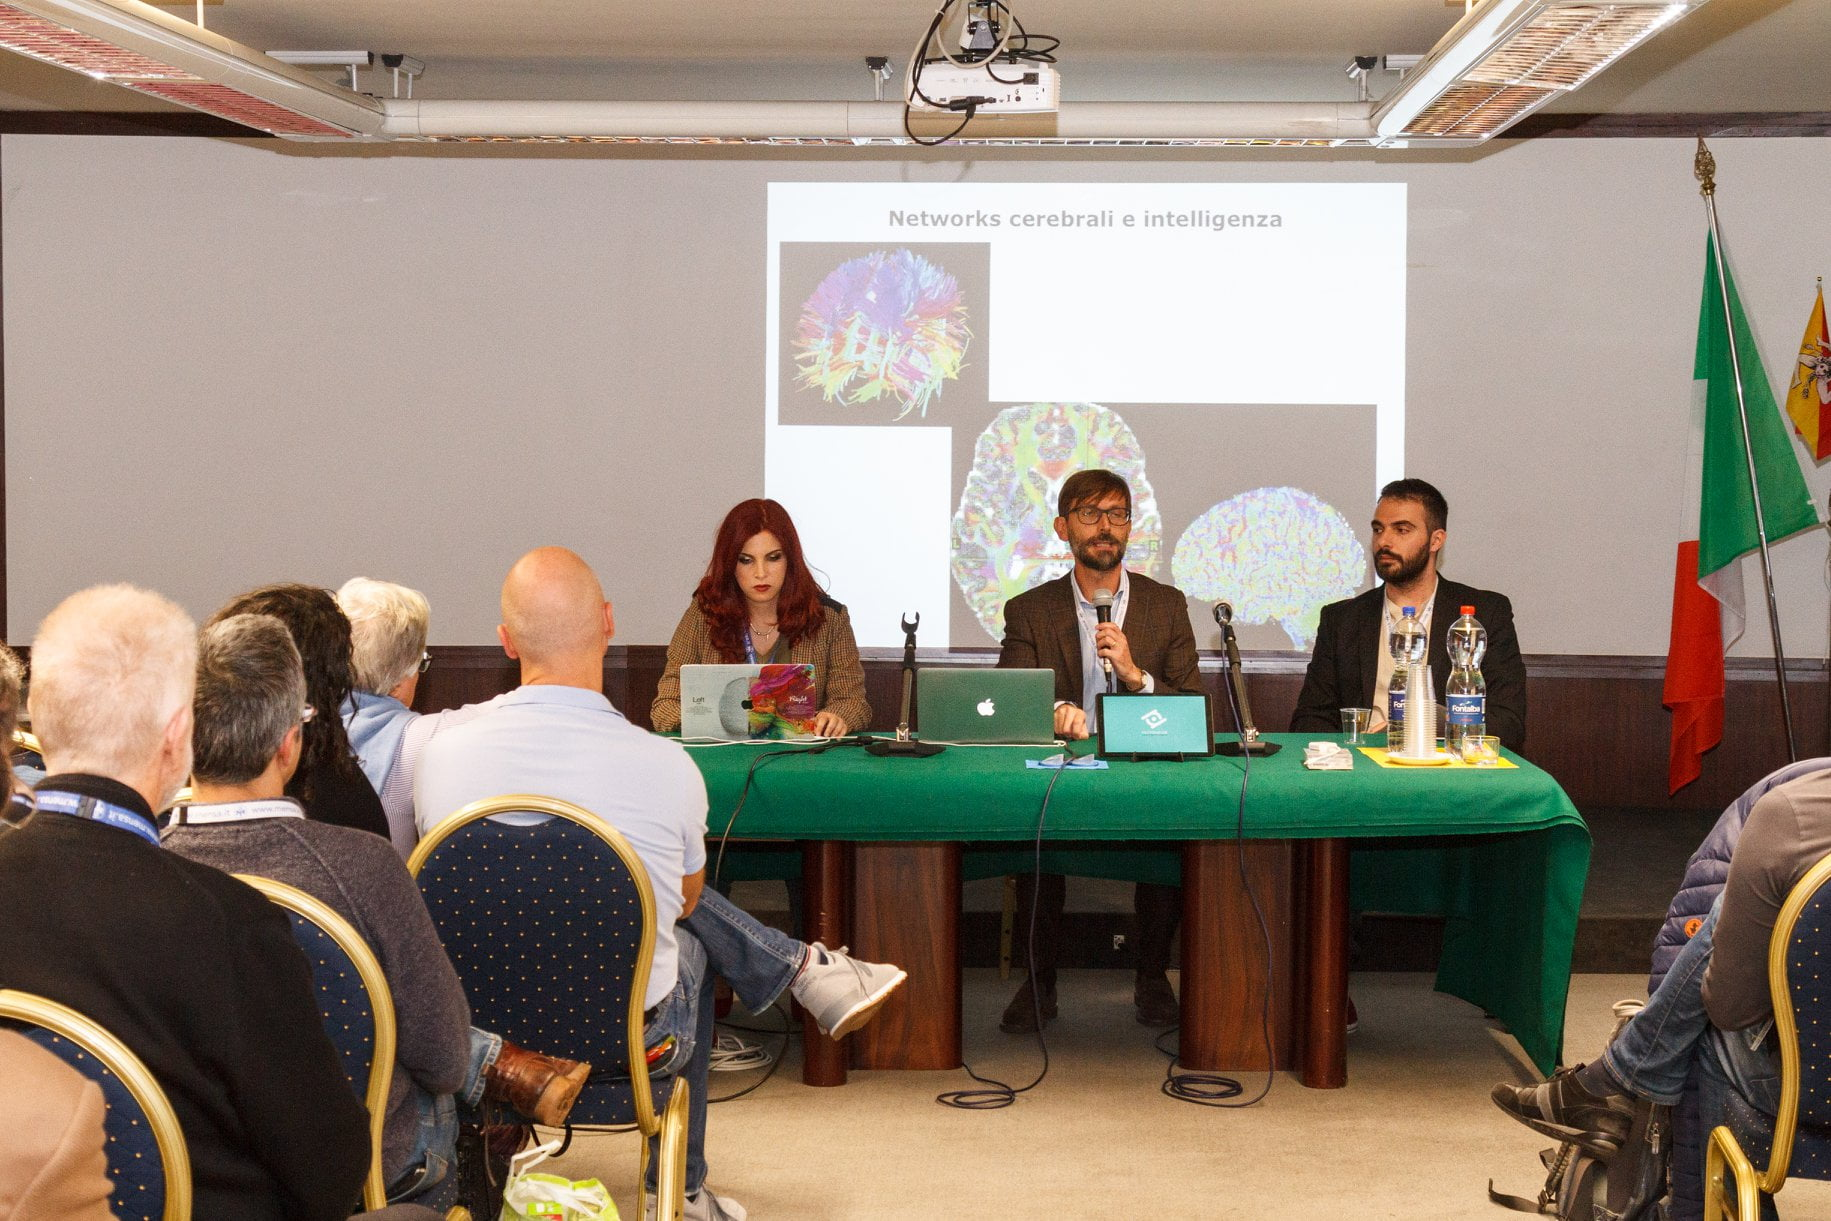 restorative neurotechnologies a mensa italia